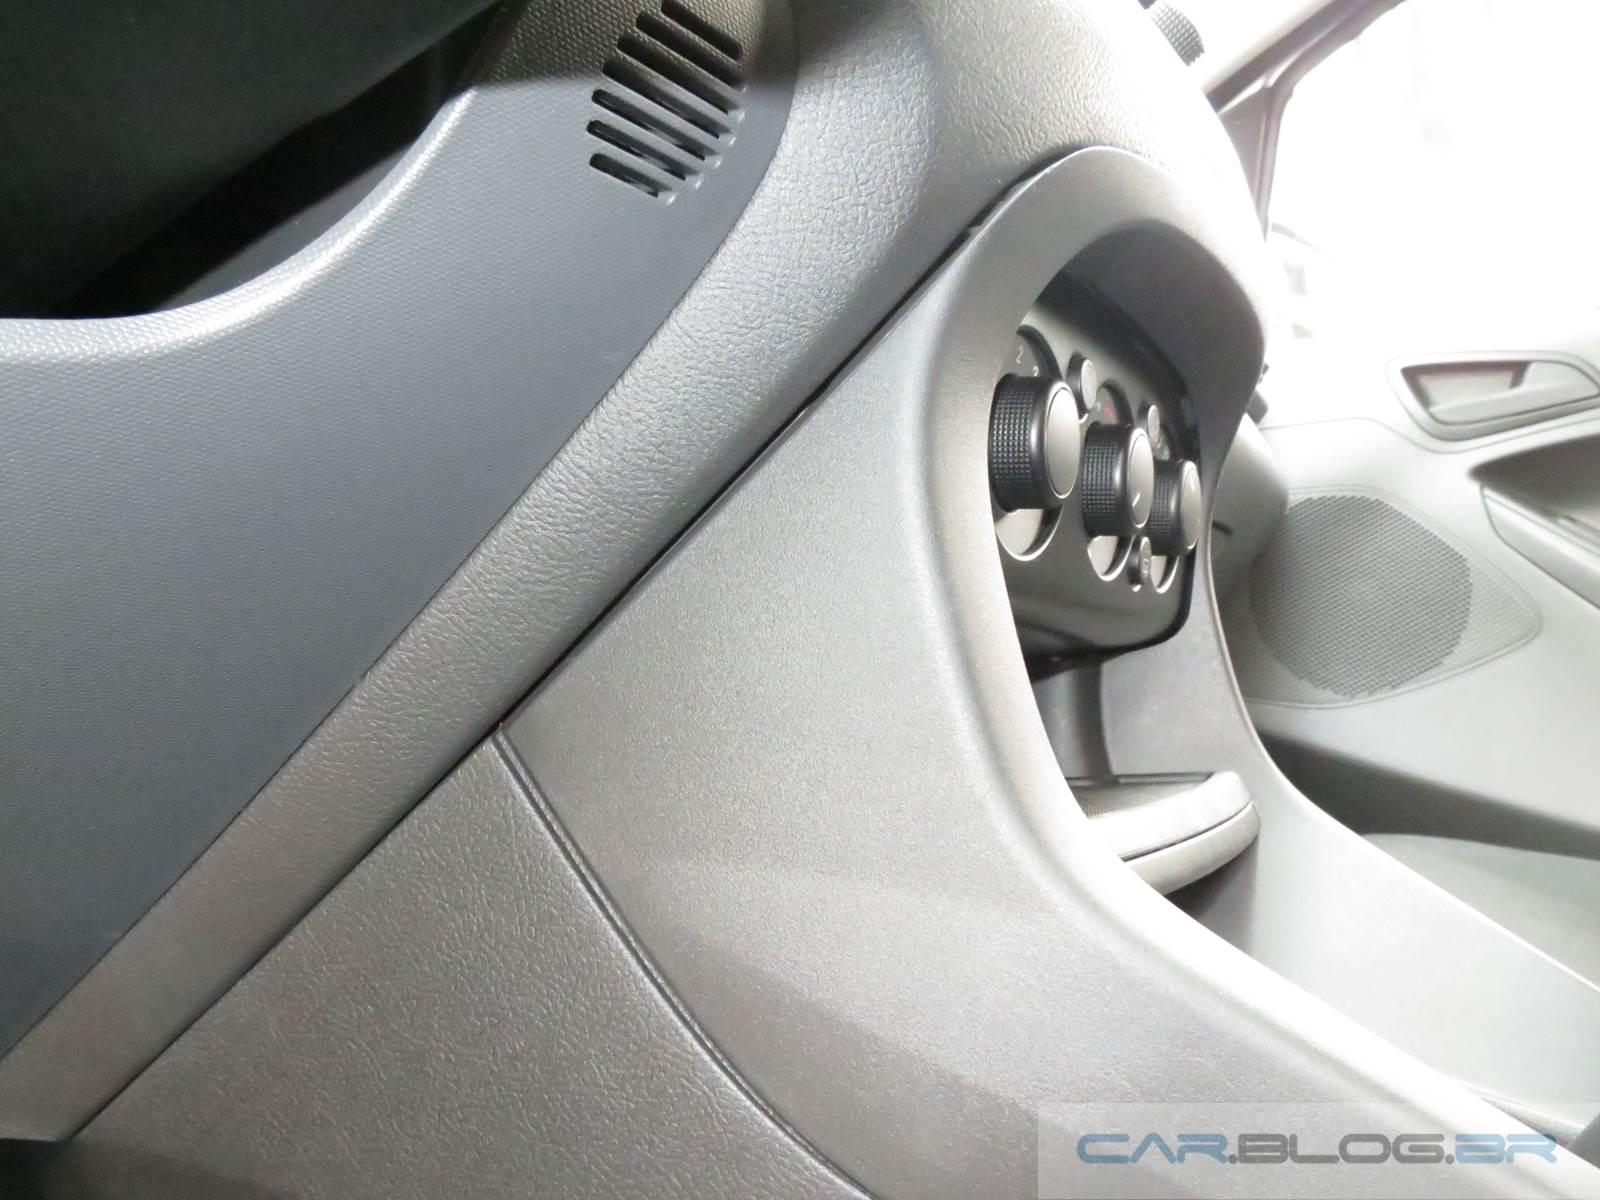 Ford Ka 2015 - problemas de acabamento